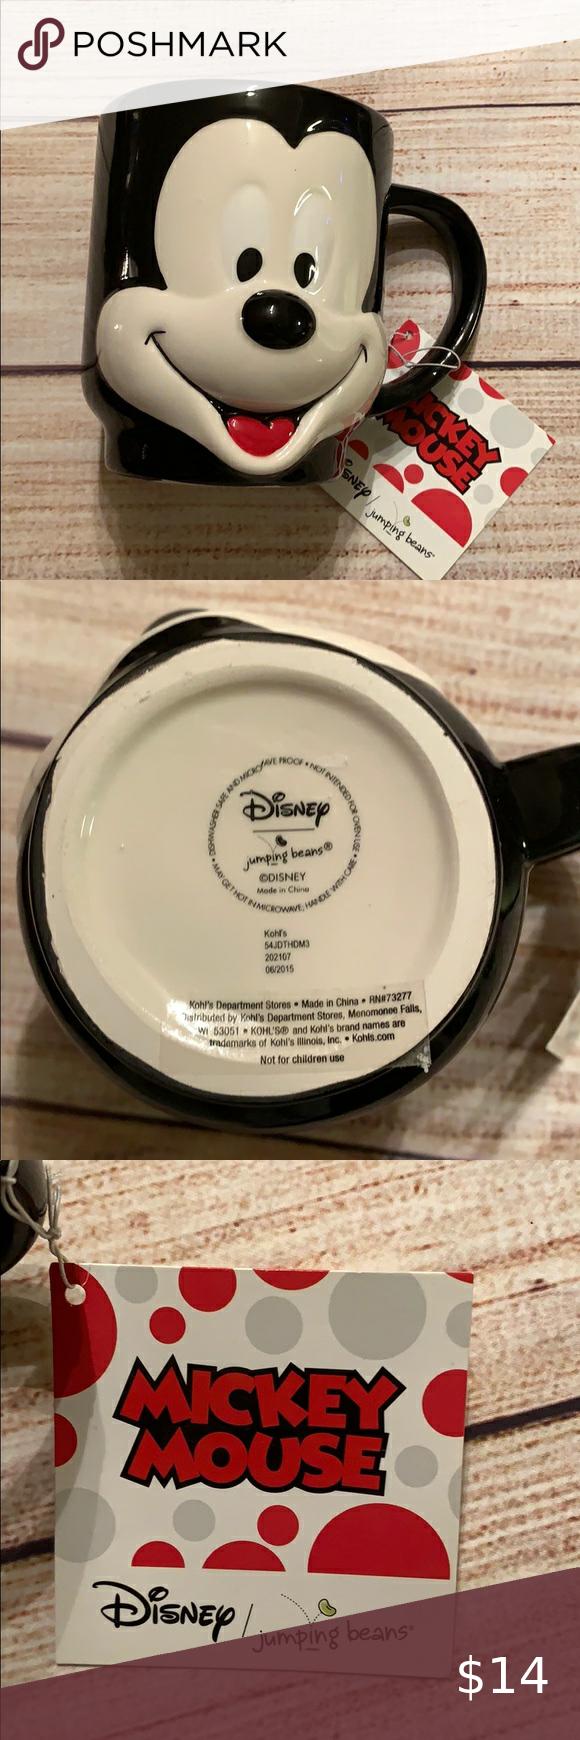 Disney Mickey Mouse Coffee Mug In 2020 Disney Mickey Mouse Mickey Mouse Disney Mickey